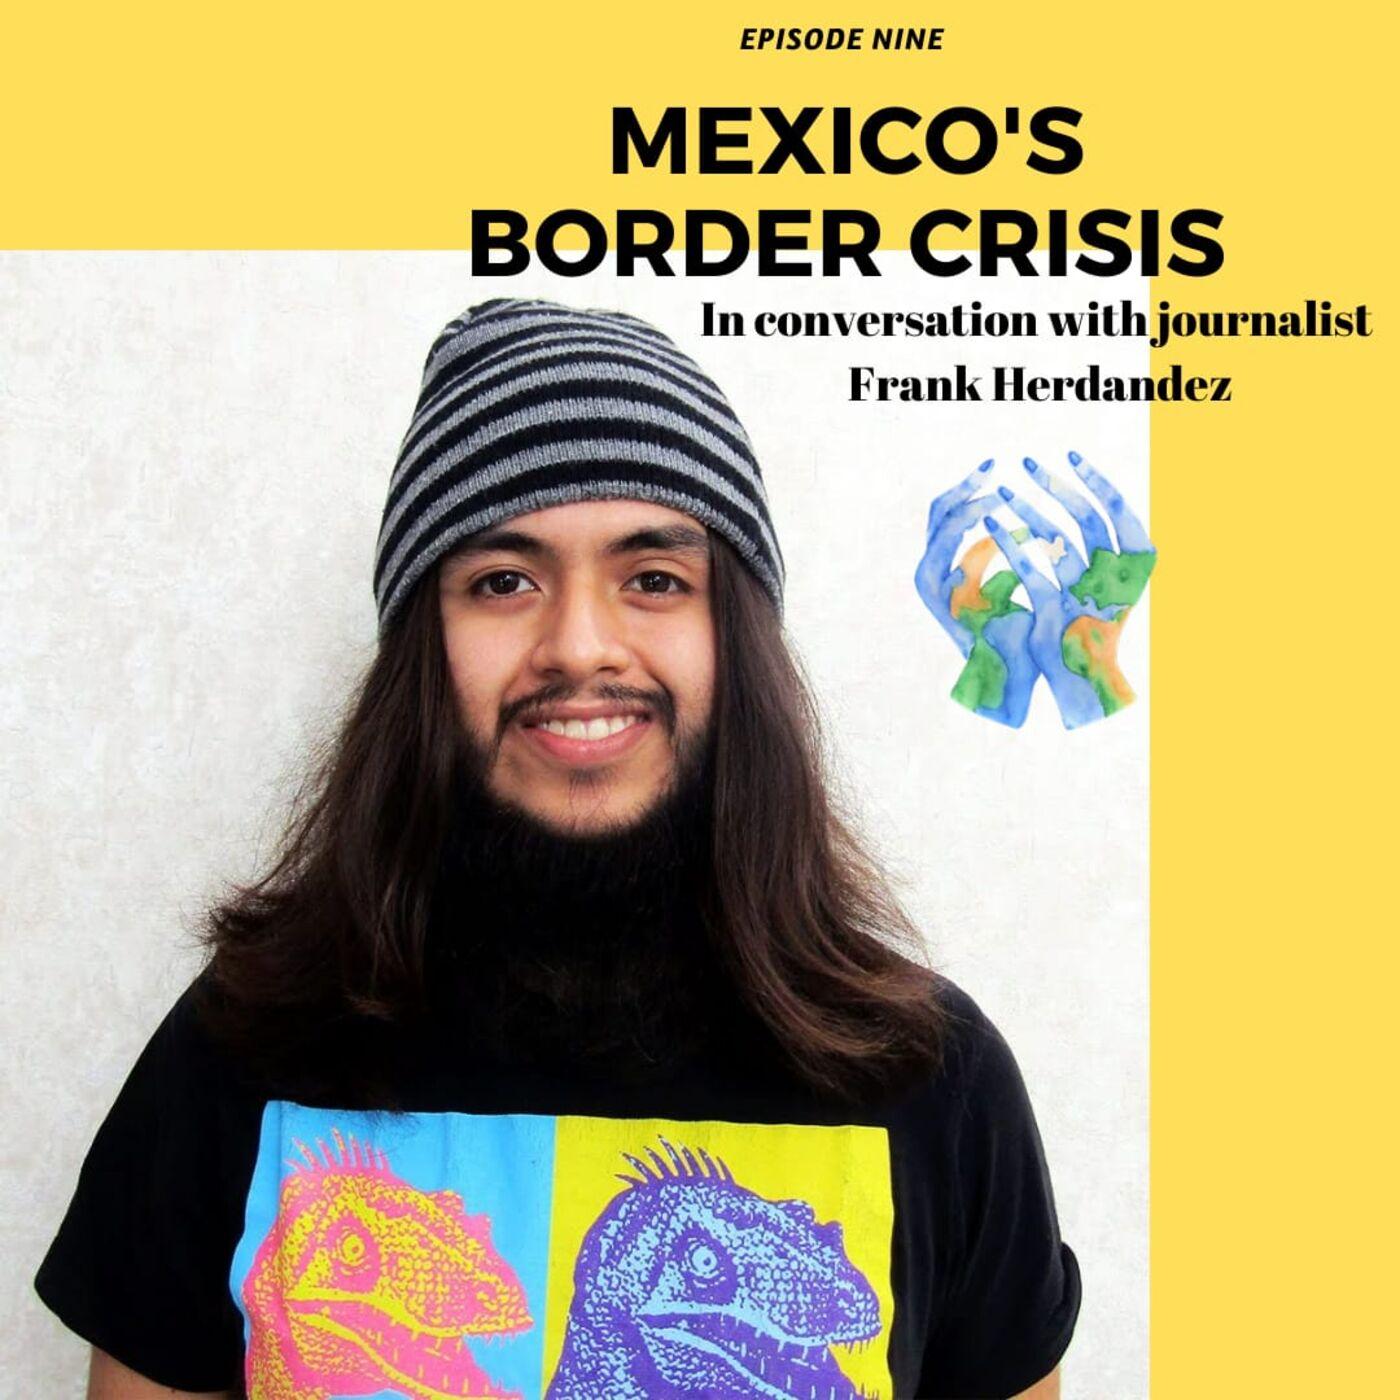 Mexico's Border Crisis with Frank Hernandez